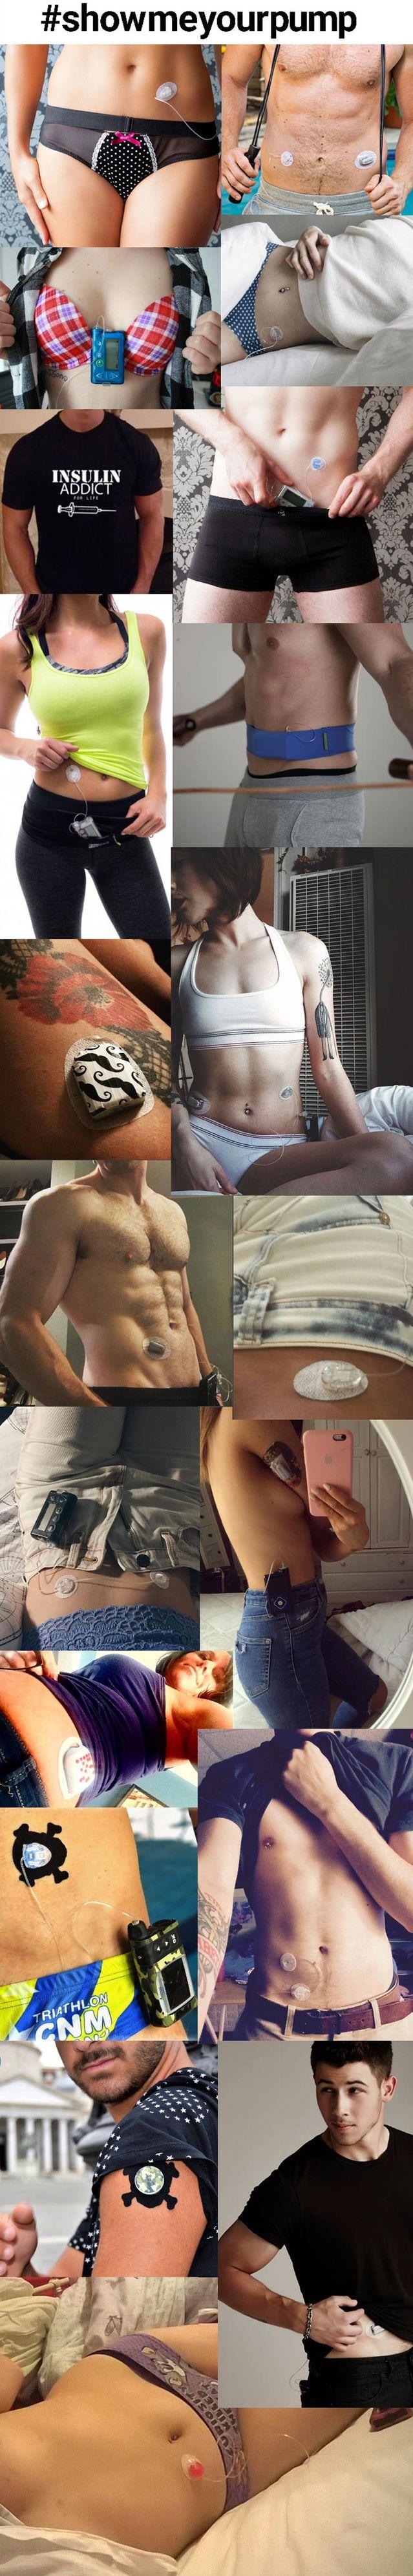 #ShowMeYourPump—Feeling Sexy When You Are Wearing a Pump